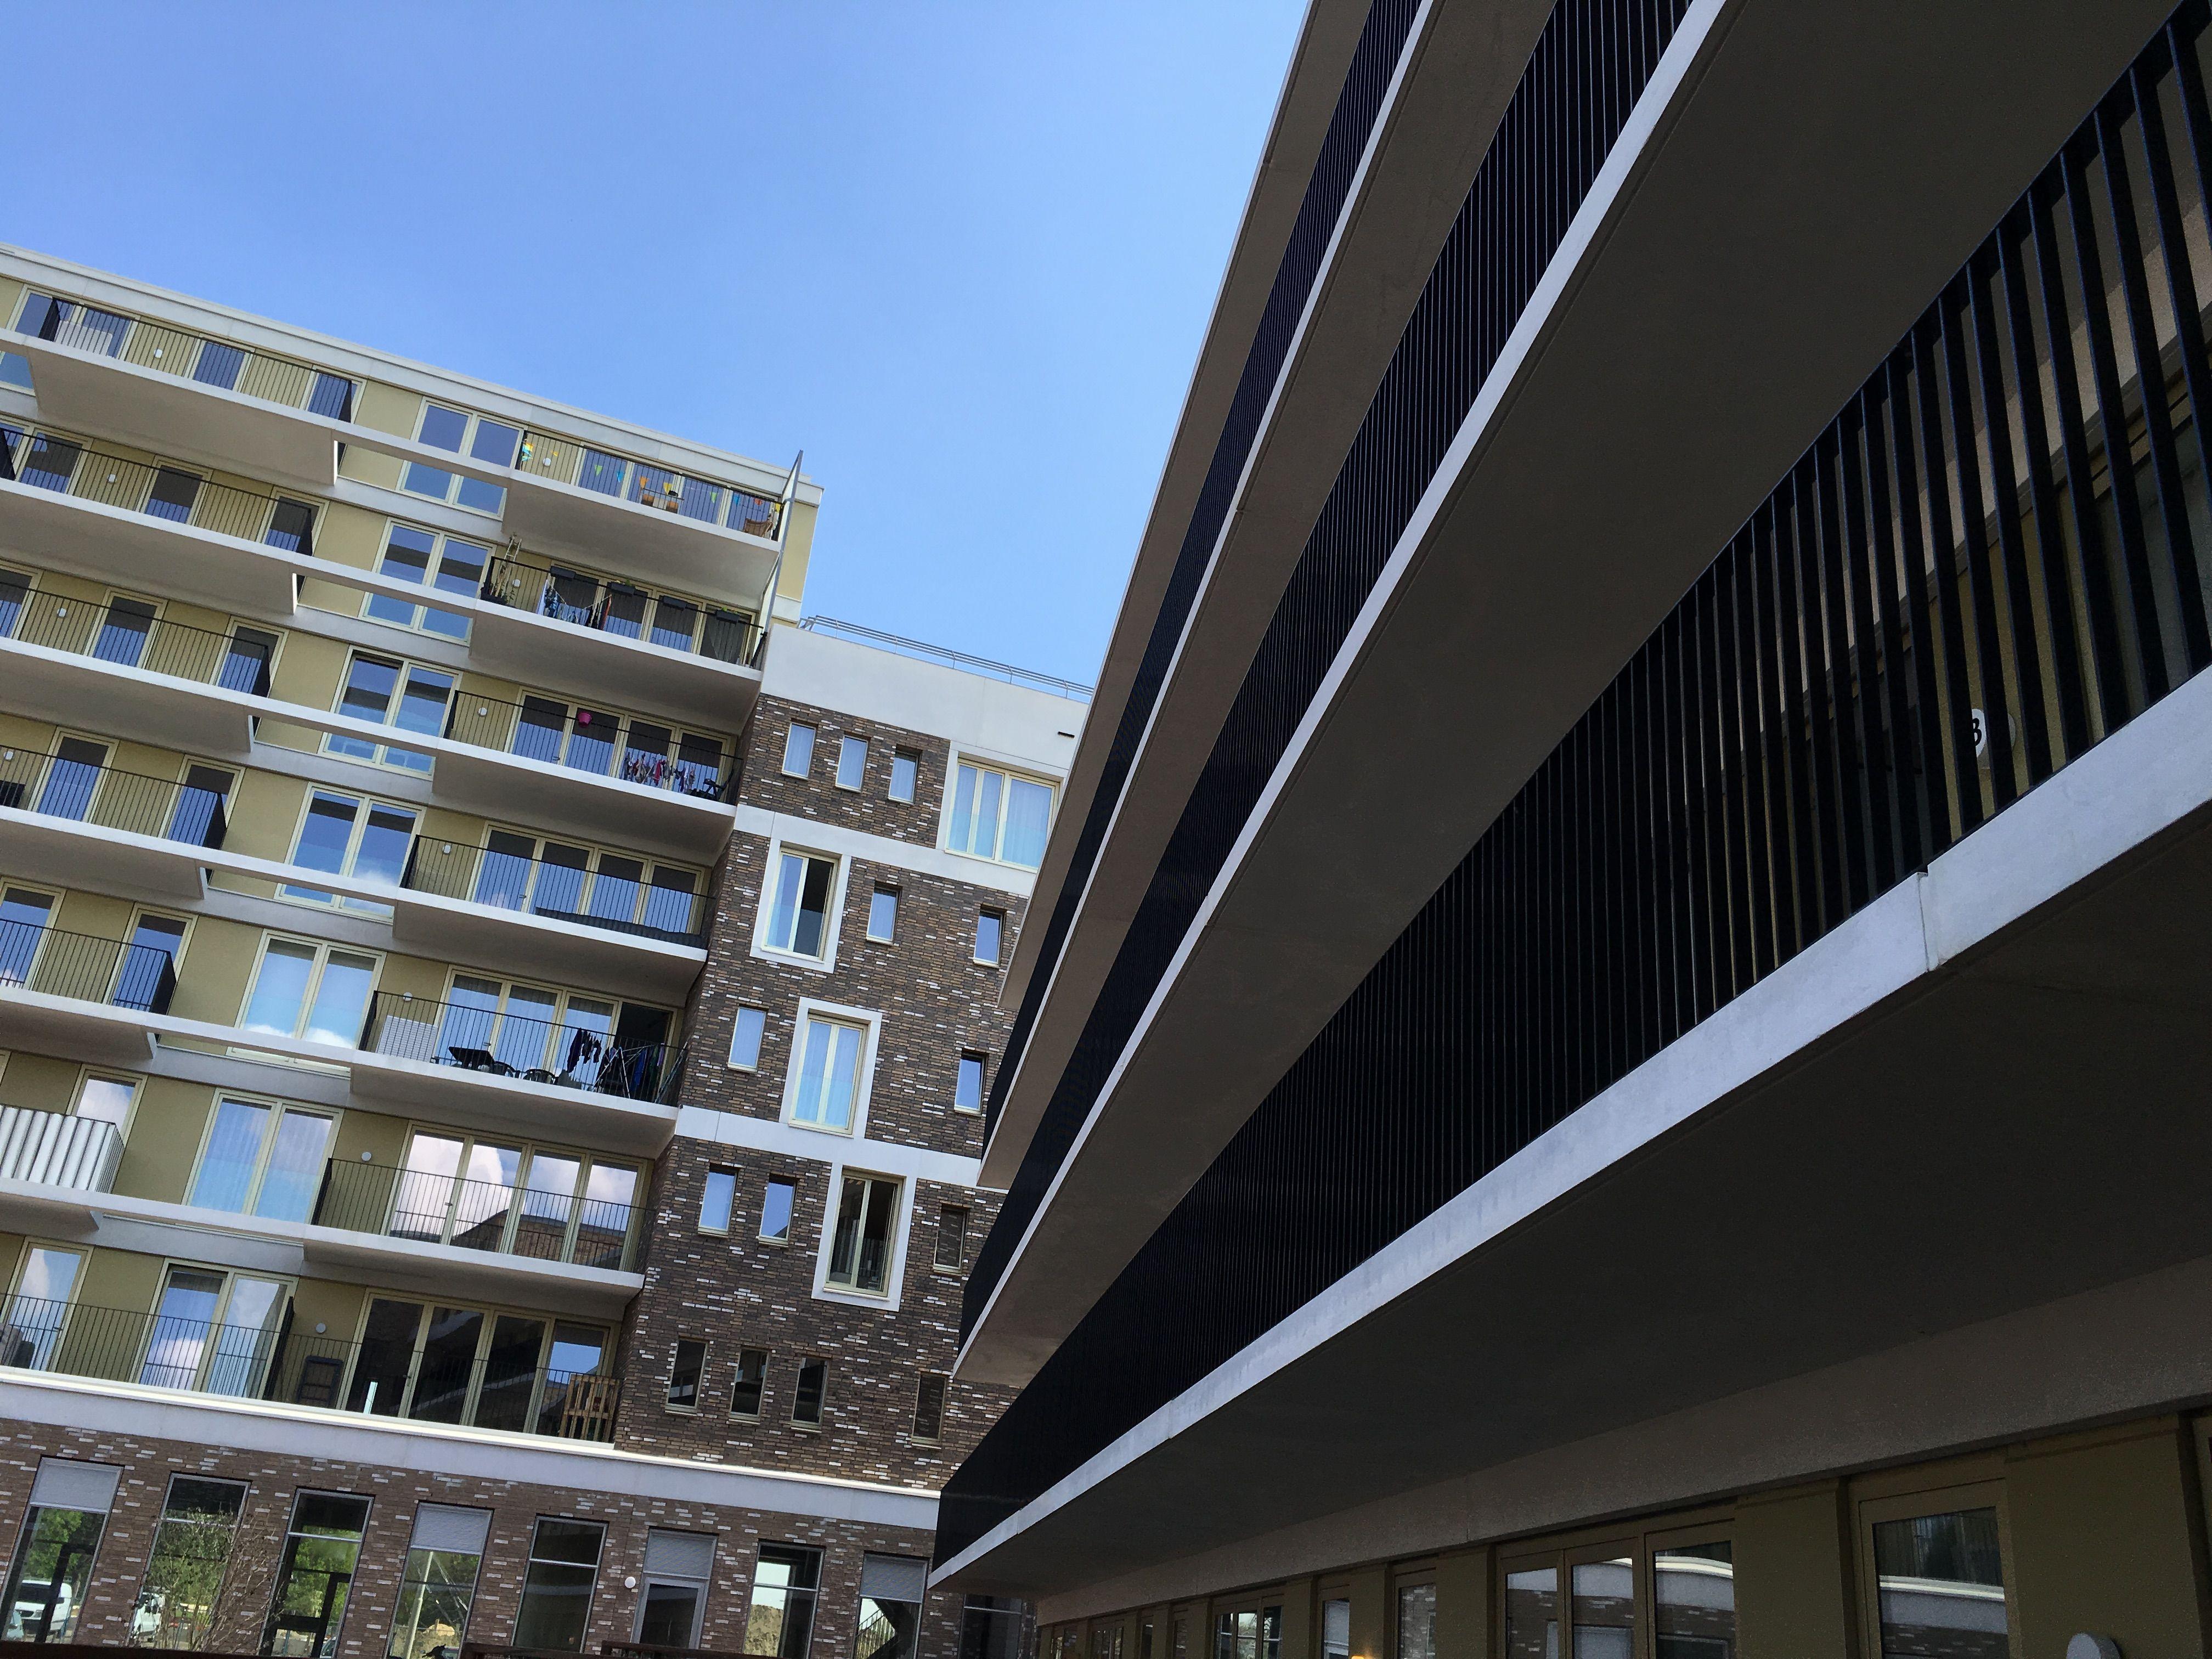 Blok 1, balkons…